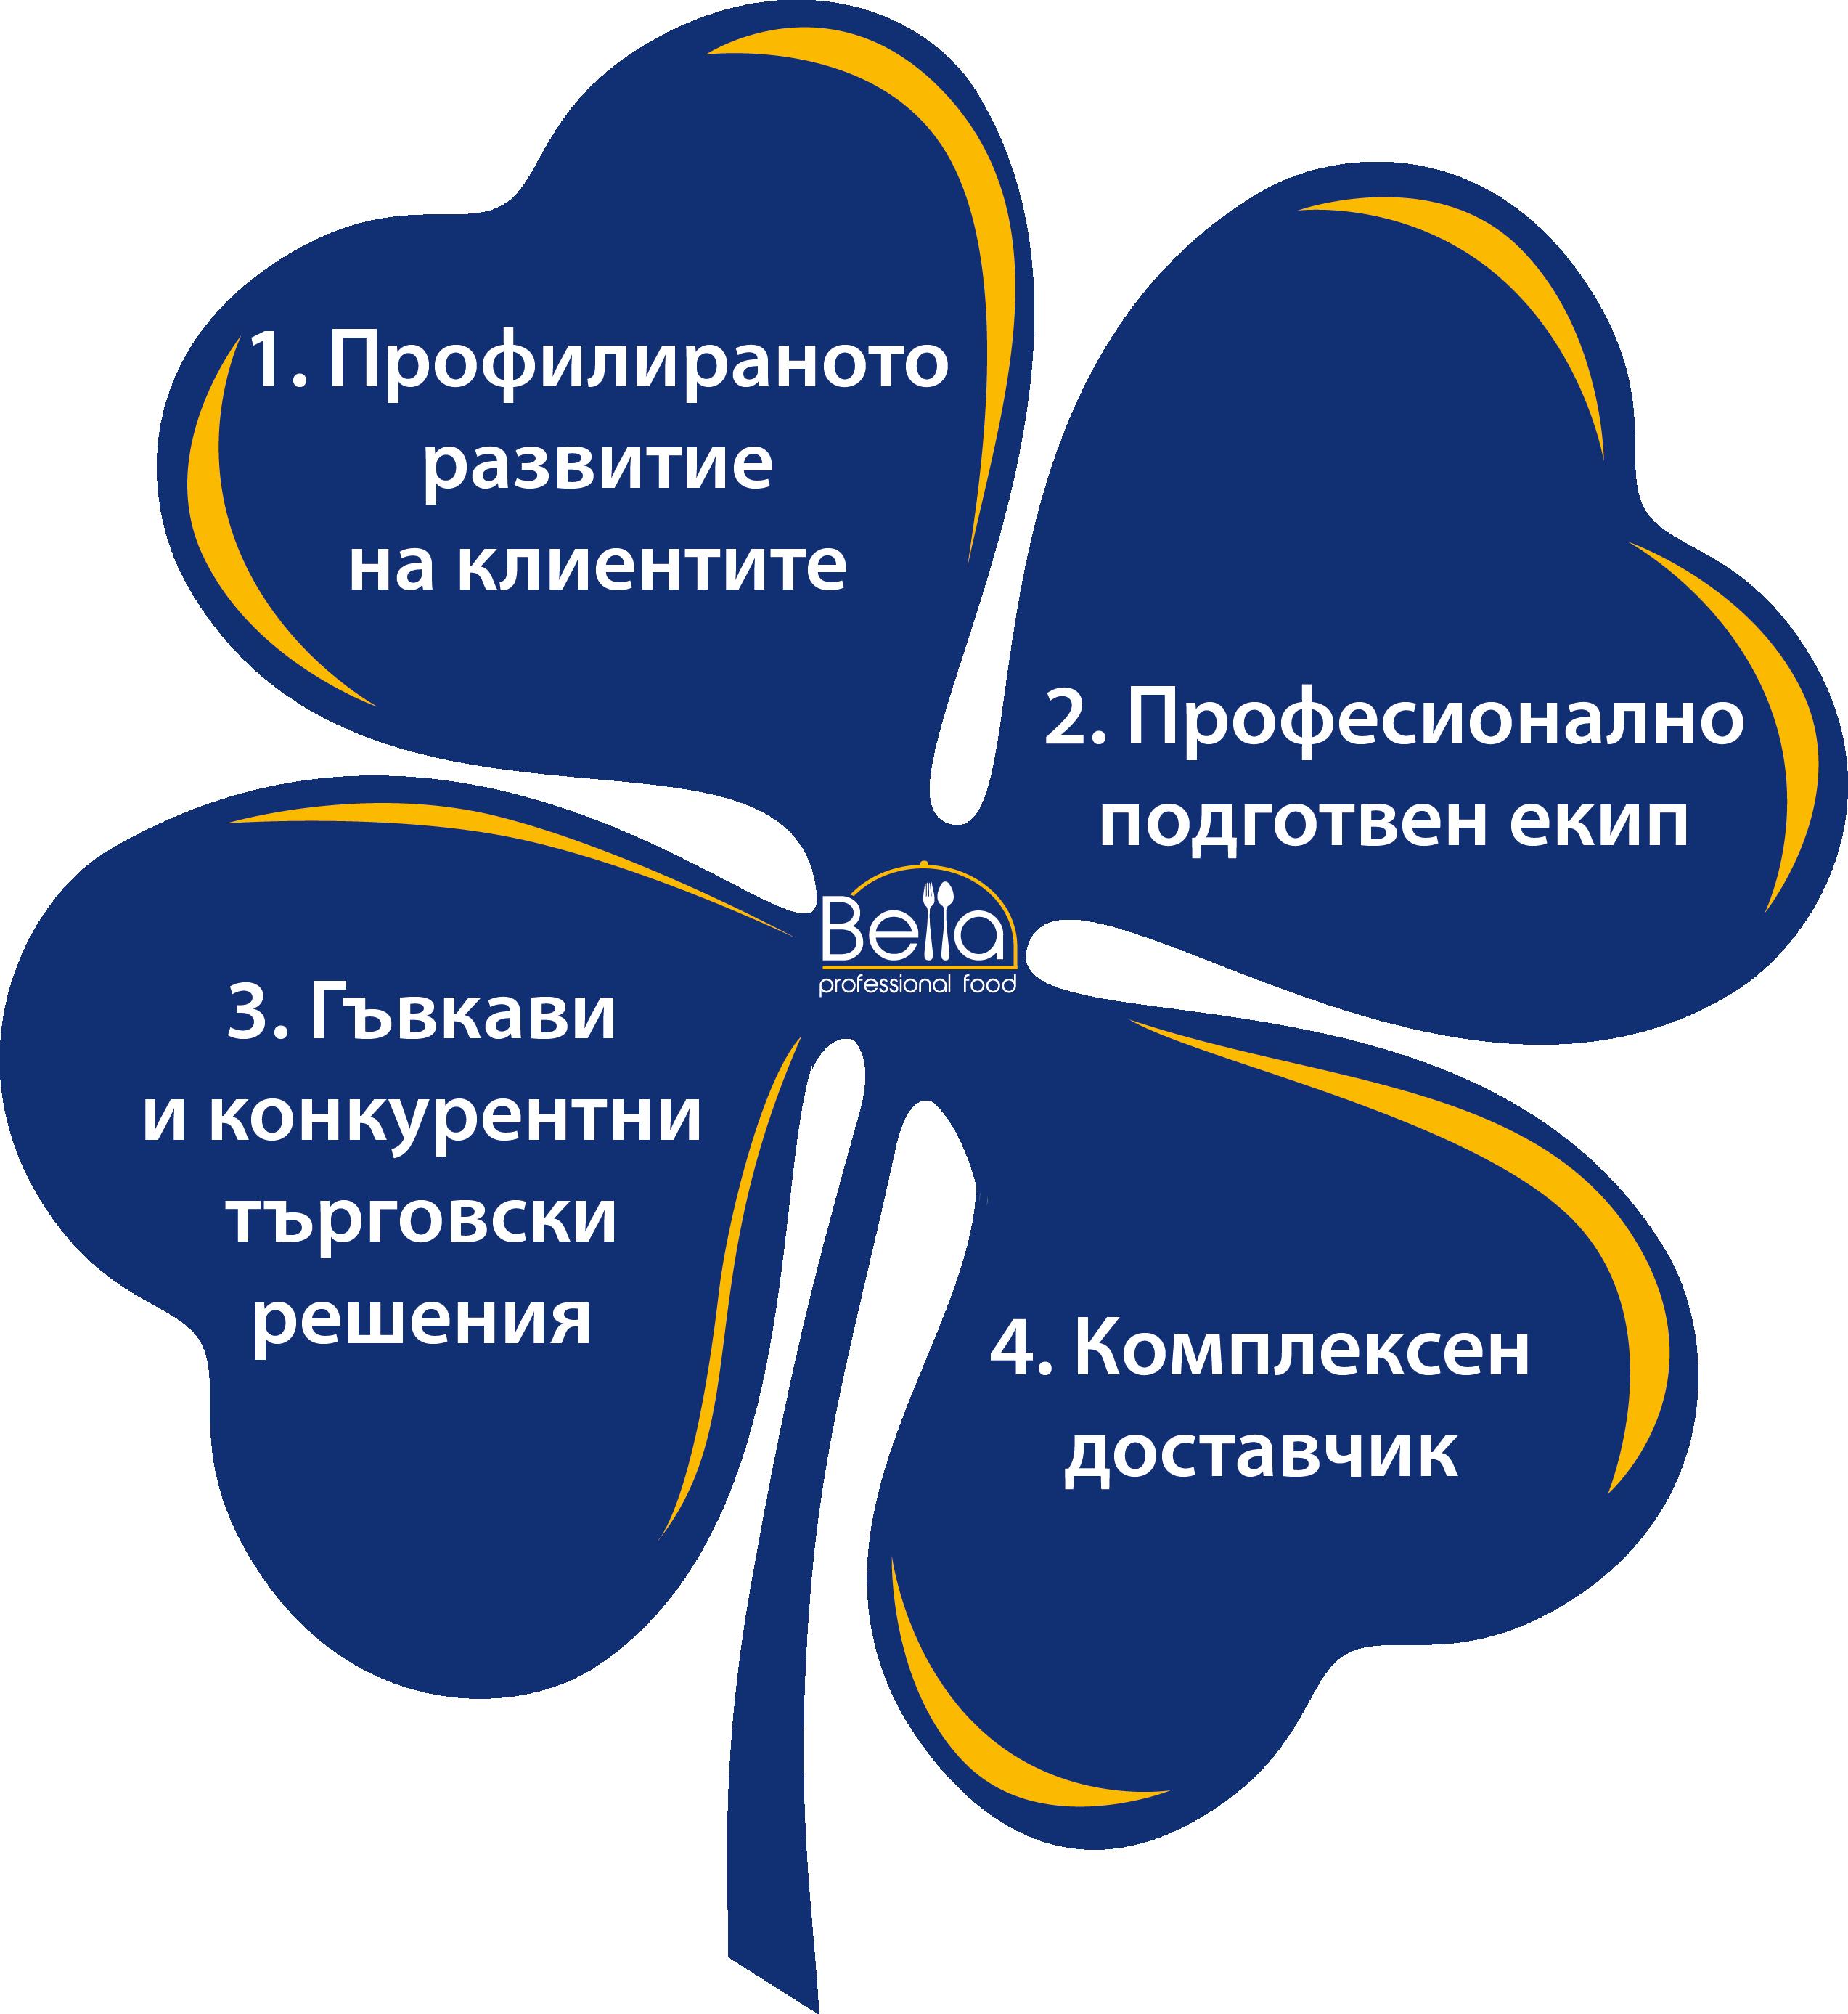 Bella Professional Food / ХоРеКа